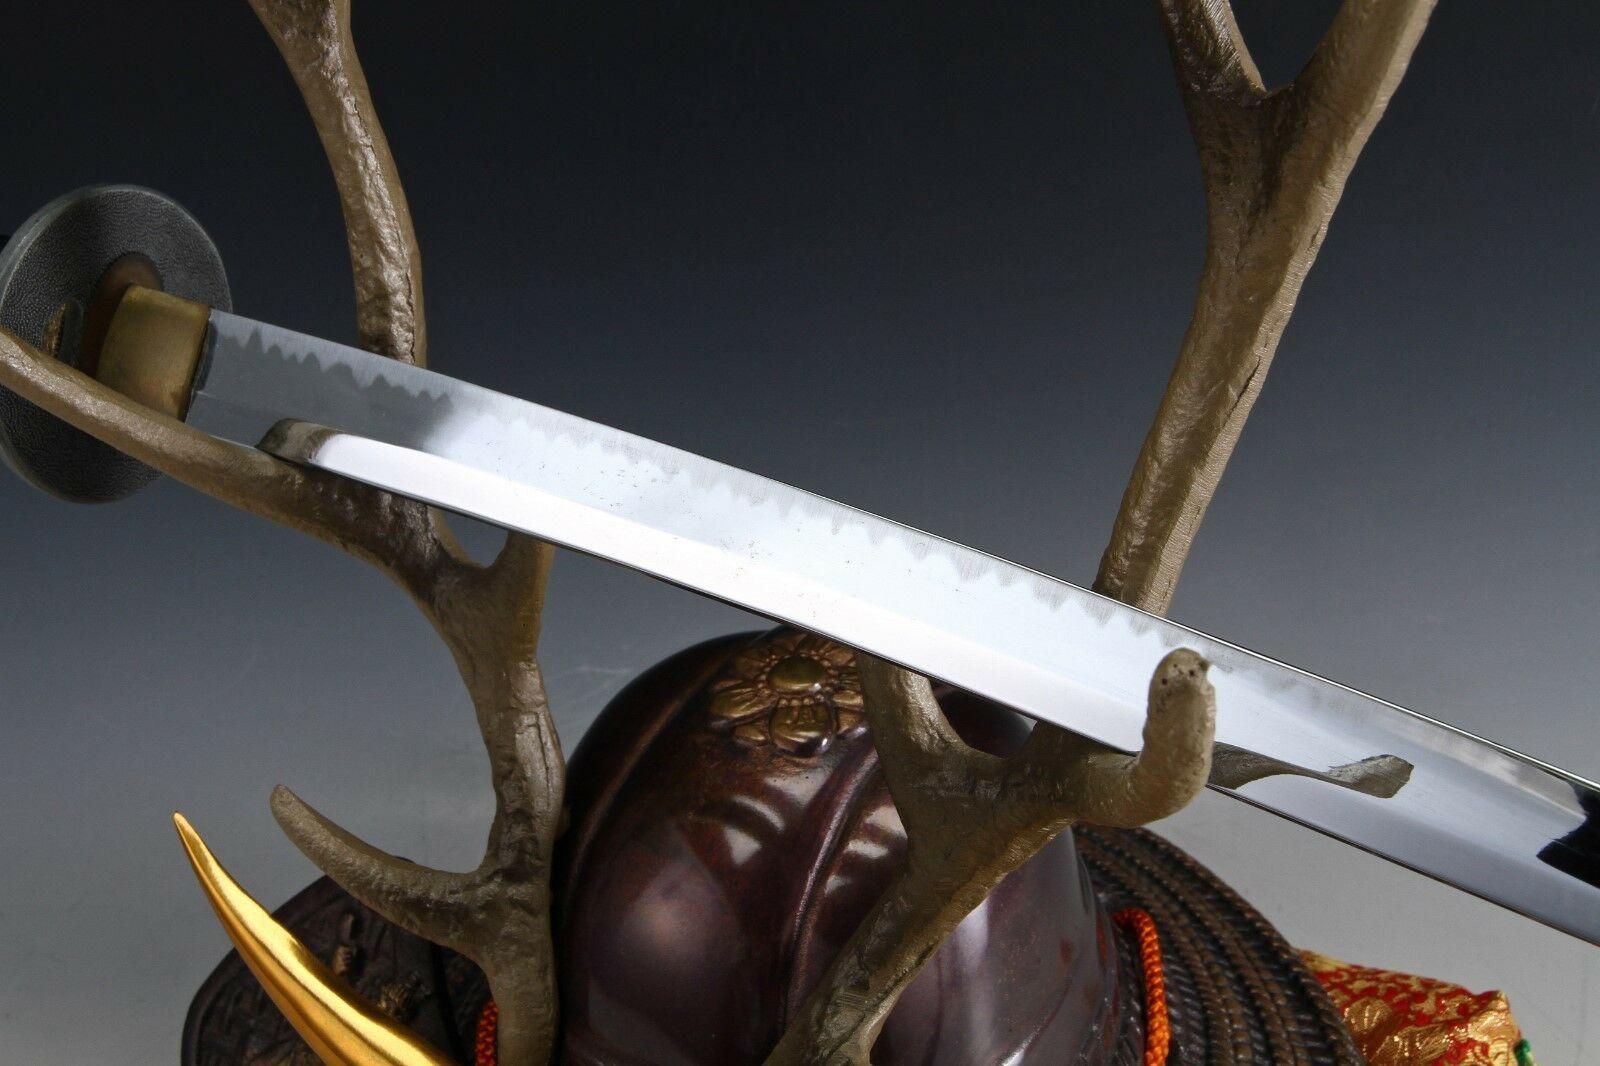 Japanese Beautiful Samurai Helmet -shikanosuke kabuto- with a Replica Blade image 9